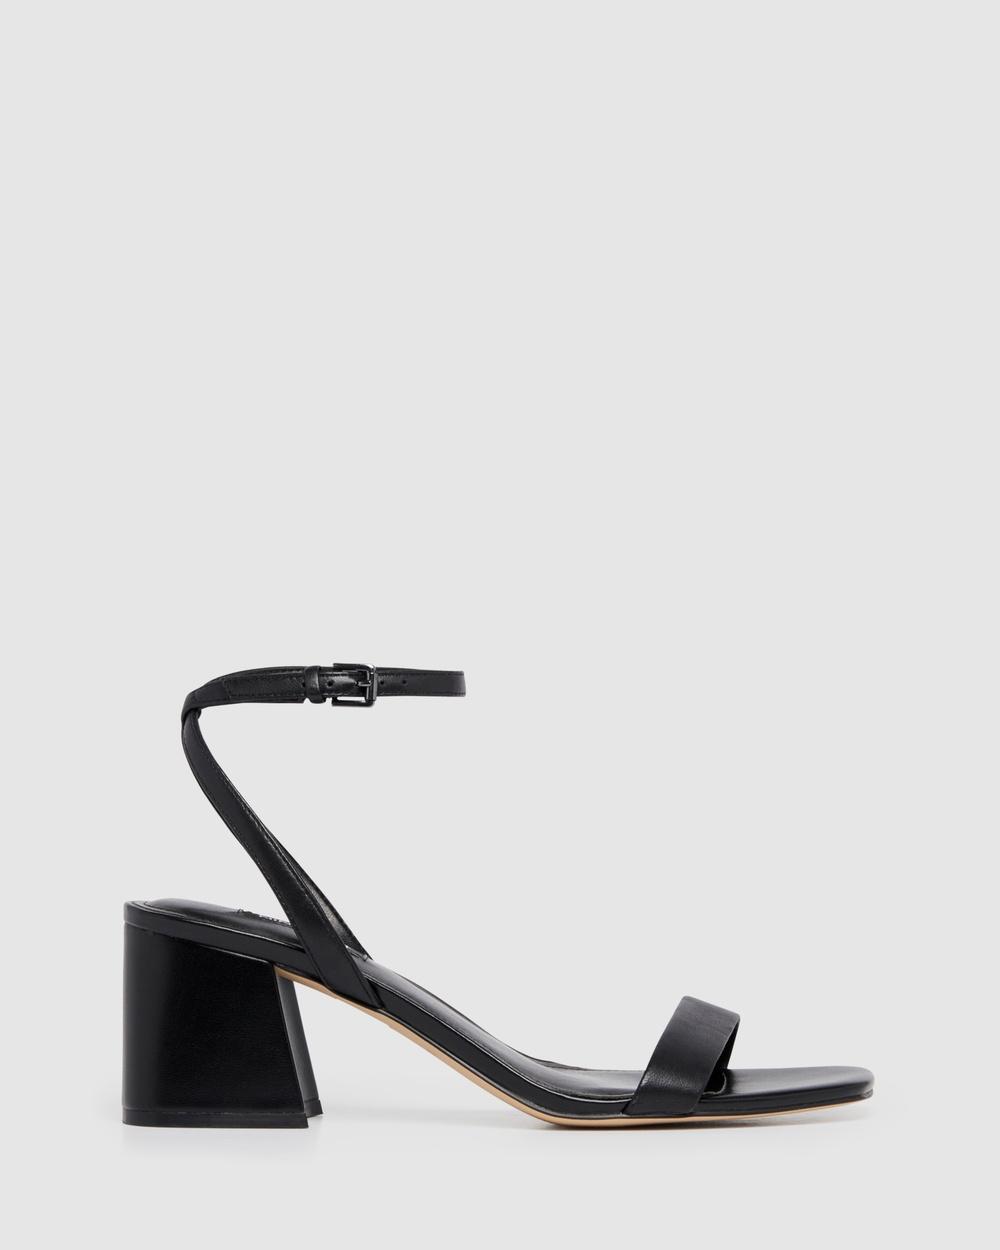 Nine West Giada Sandals BLACK Australia